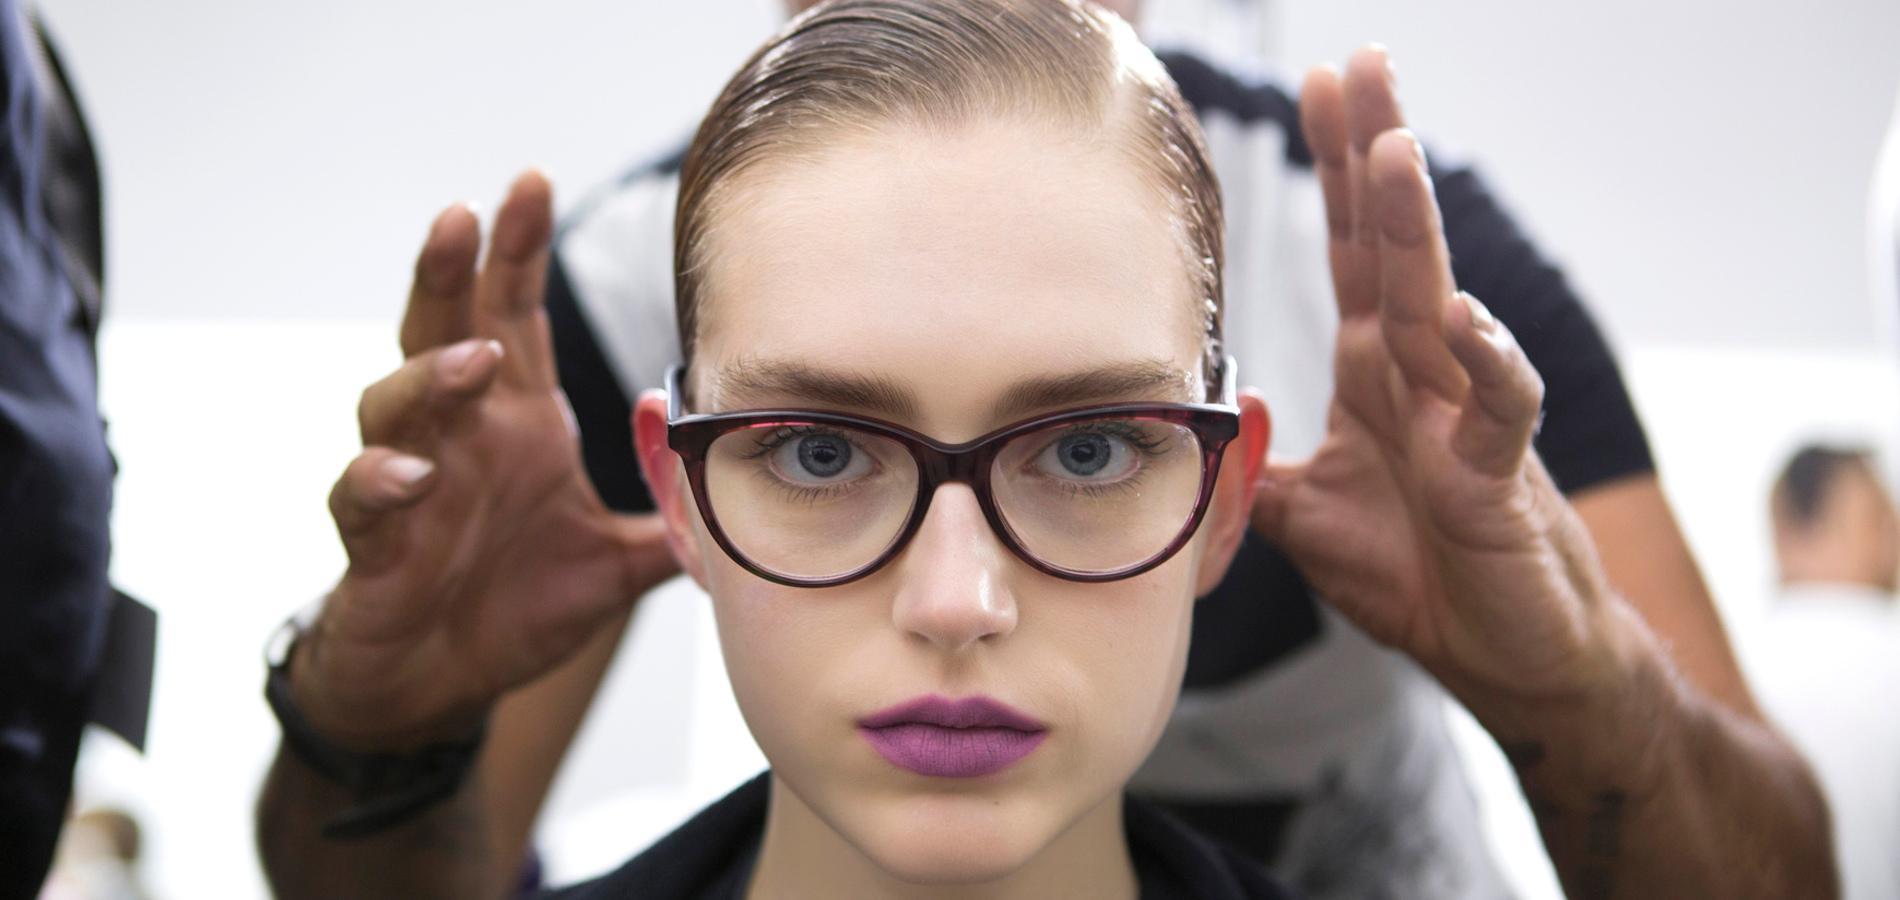 Maquillage yeux lunettes tuto vido un maquillage des yeux - Maquillage avec lunette ...